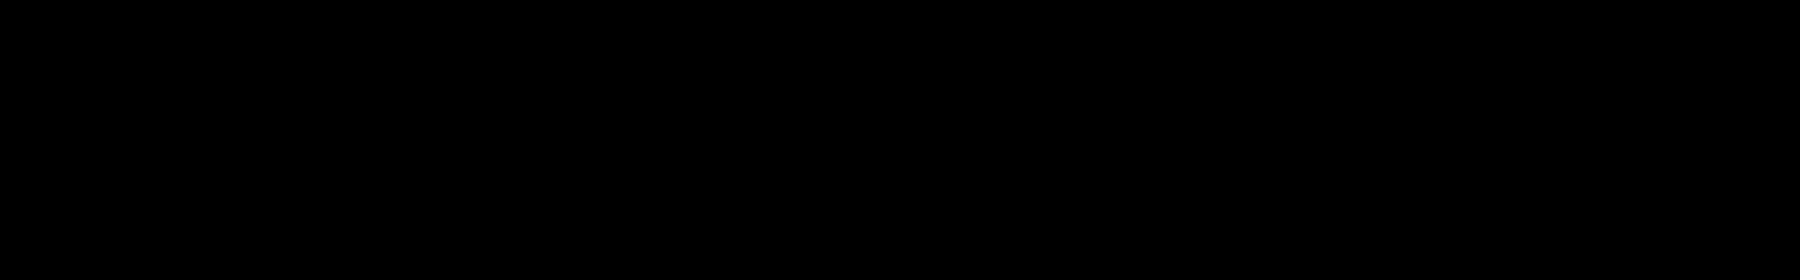 Ansonix Chiptune Dnb audio waveform